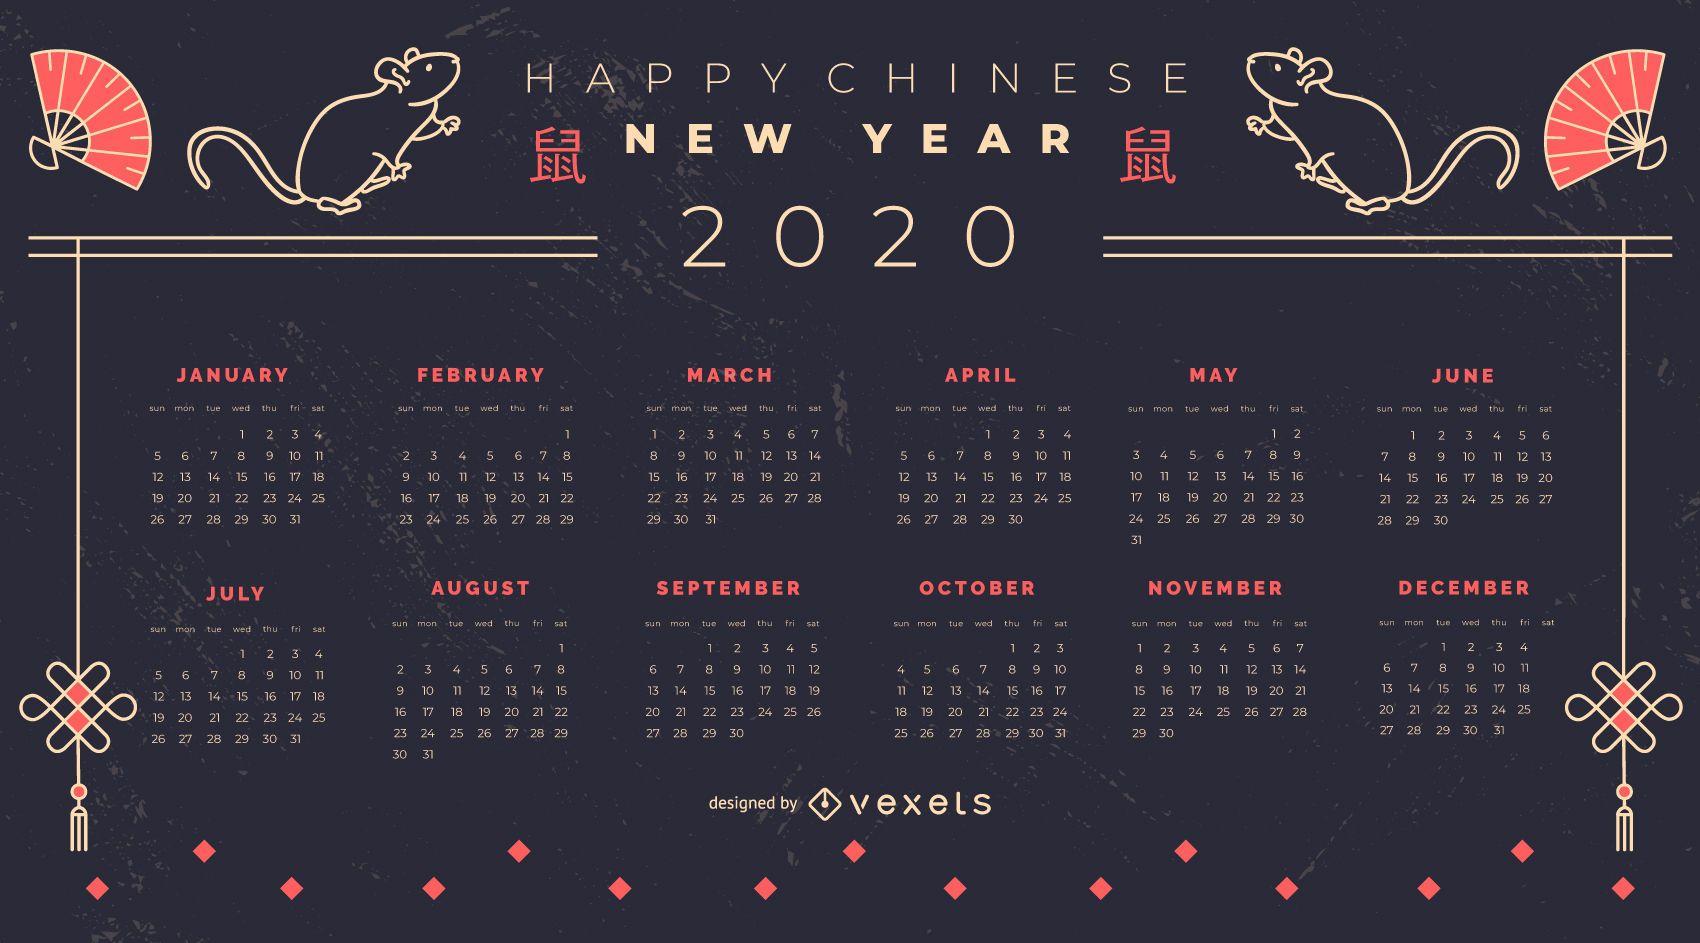 Chinese new year 2020 calendar design